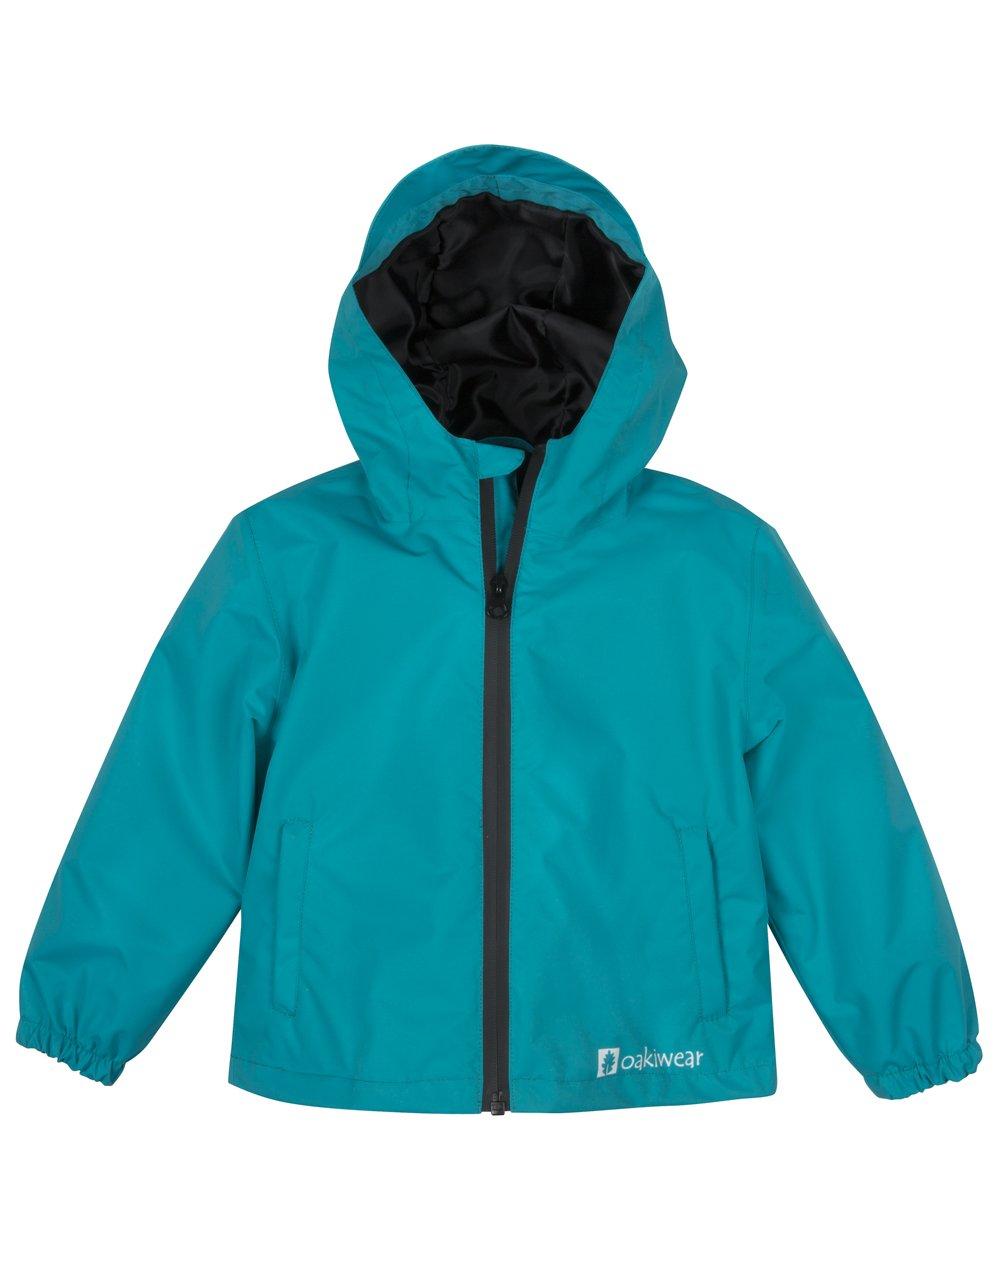 Lightweight with Hood Waterproof OAKI Rain Jacket for Kids//Toddlers Breathable